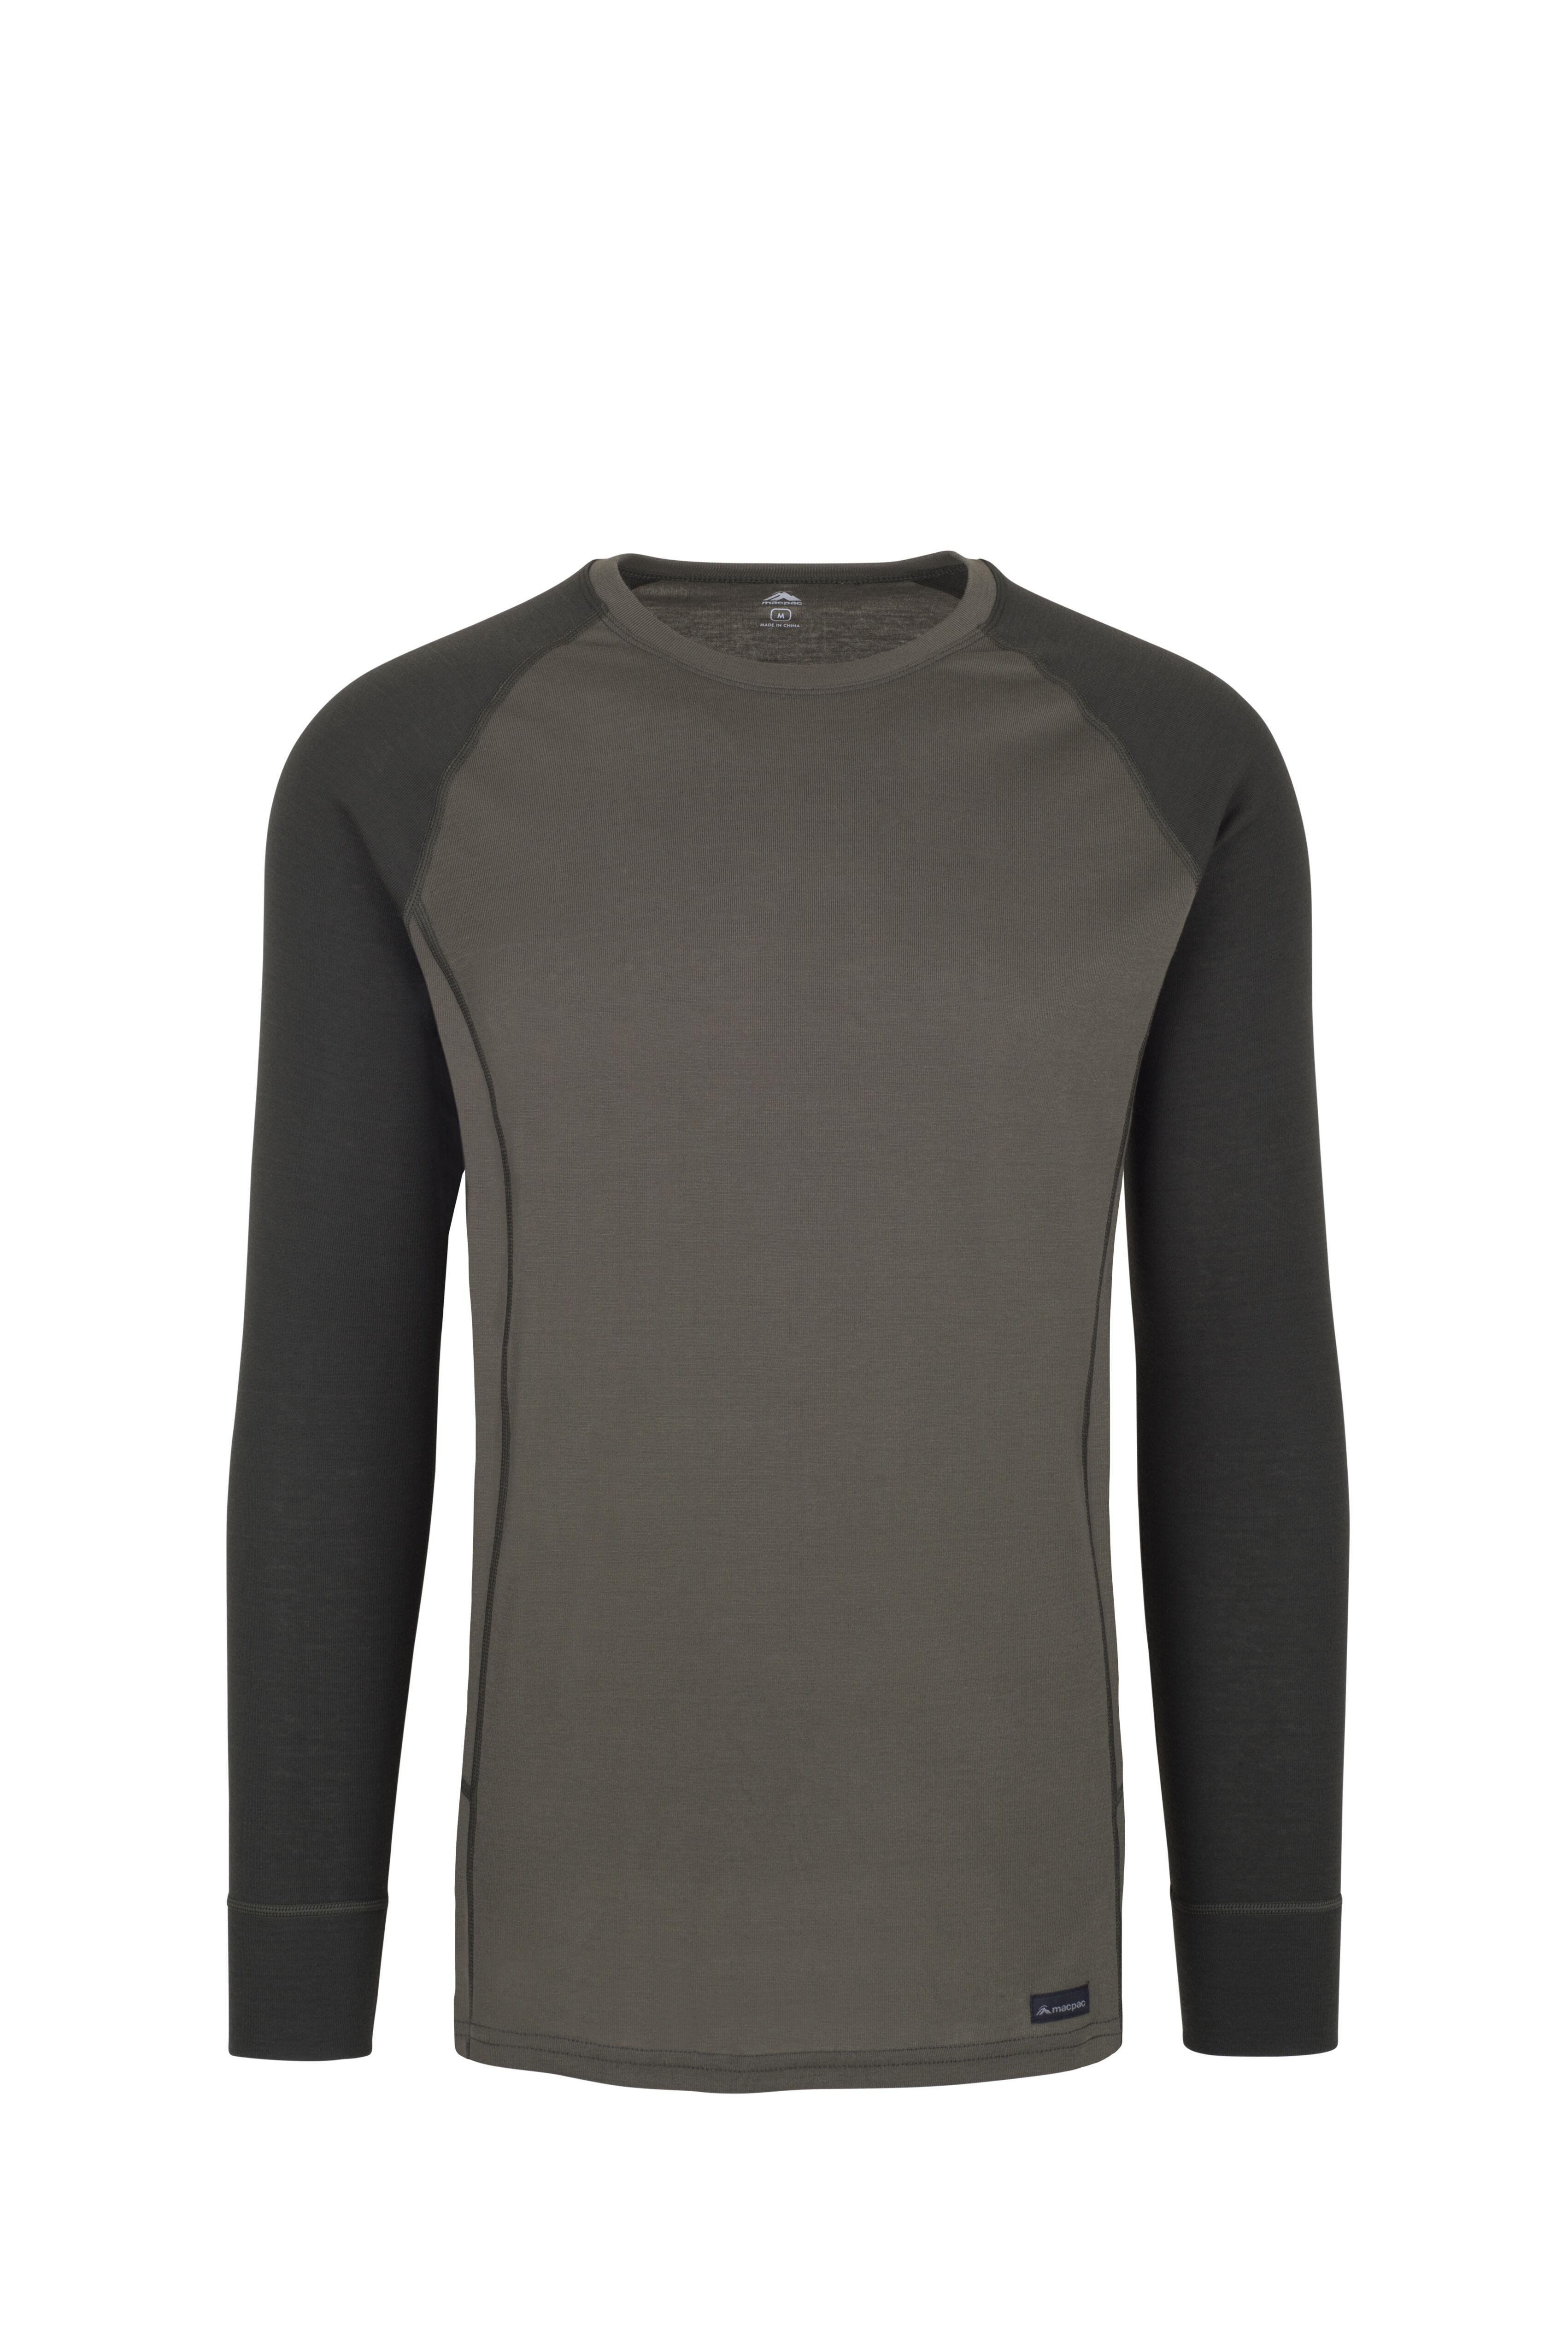 Womens Shirt Checked Short Sleeve Cotton Hiking Camping Outdoor Work Top Jenn